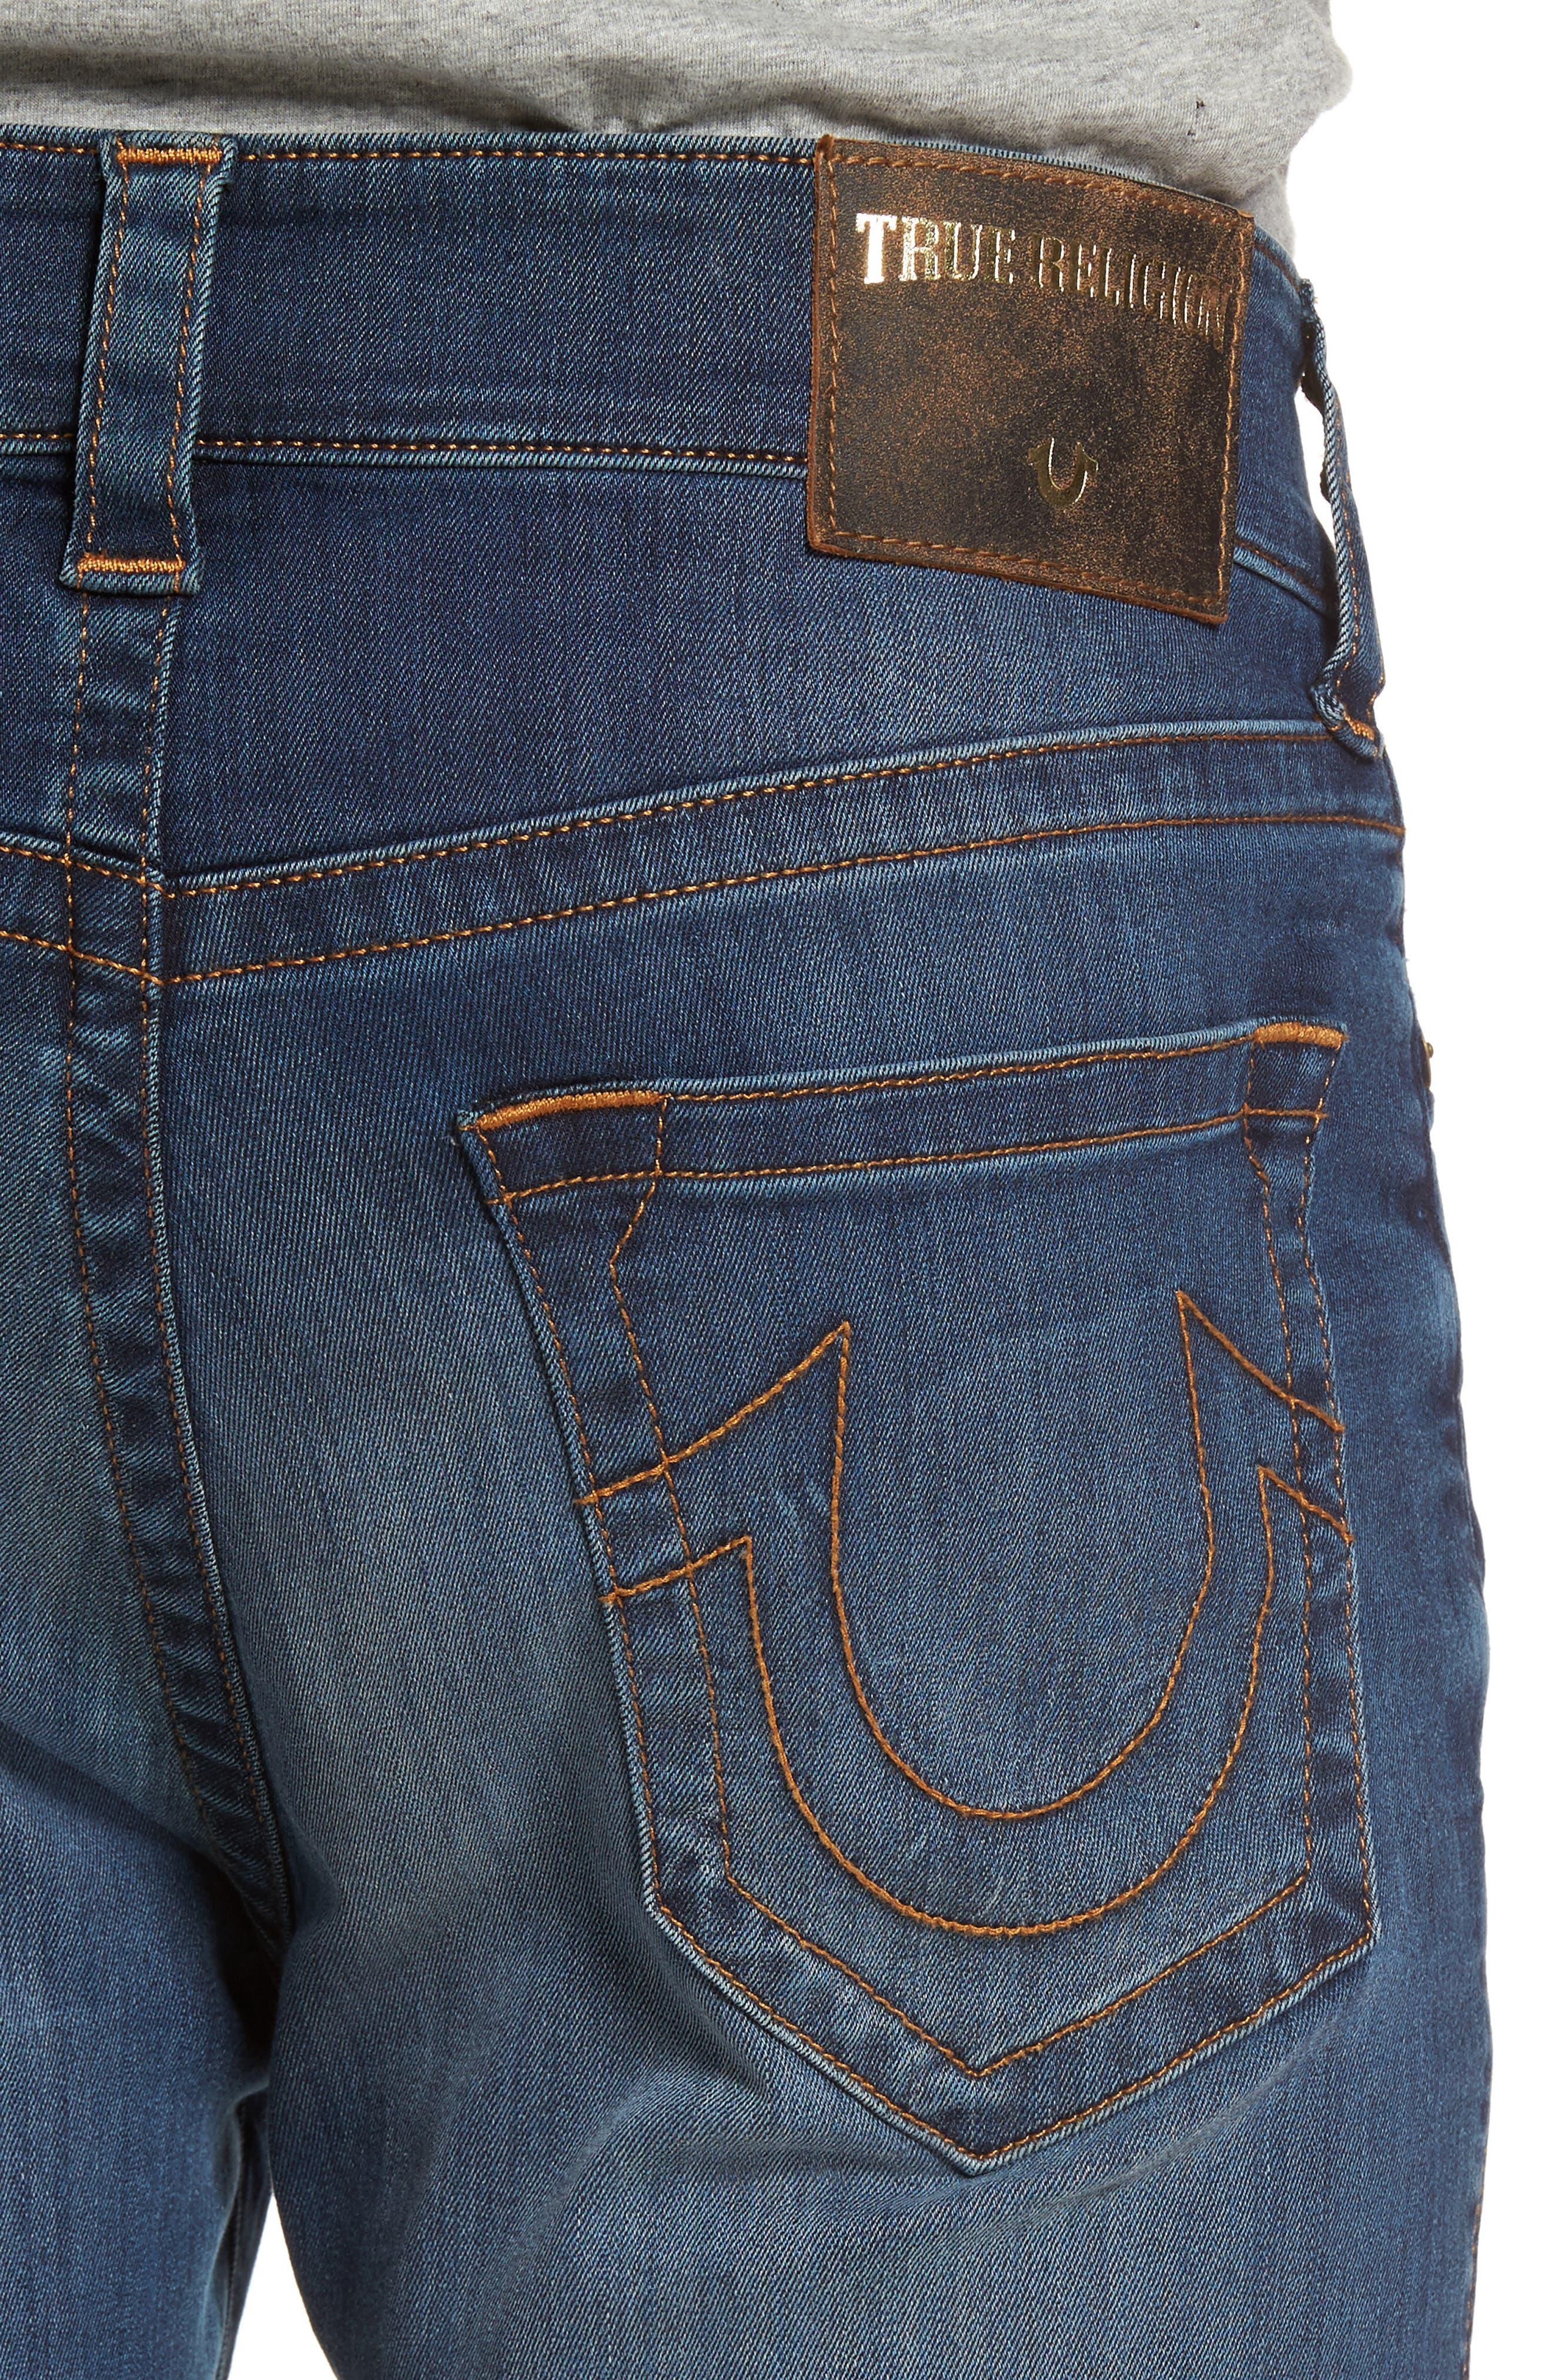 Alternate Image 4  - True Religion Brand Jeans Jack Skinny Fit Jeans (Desert Highway)